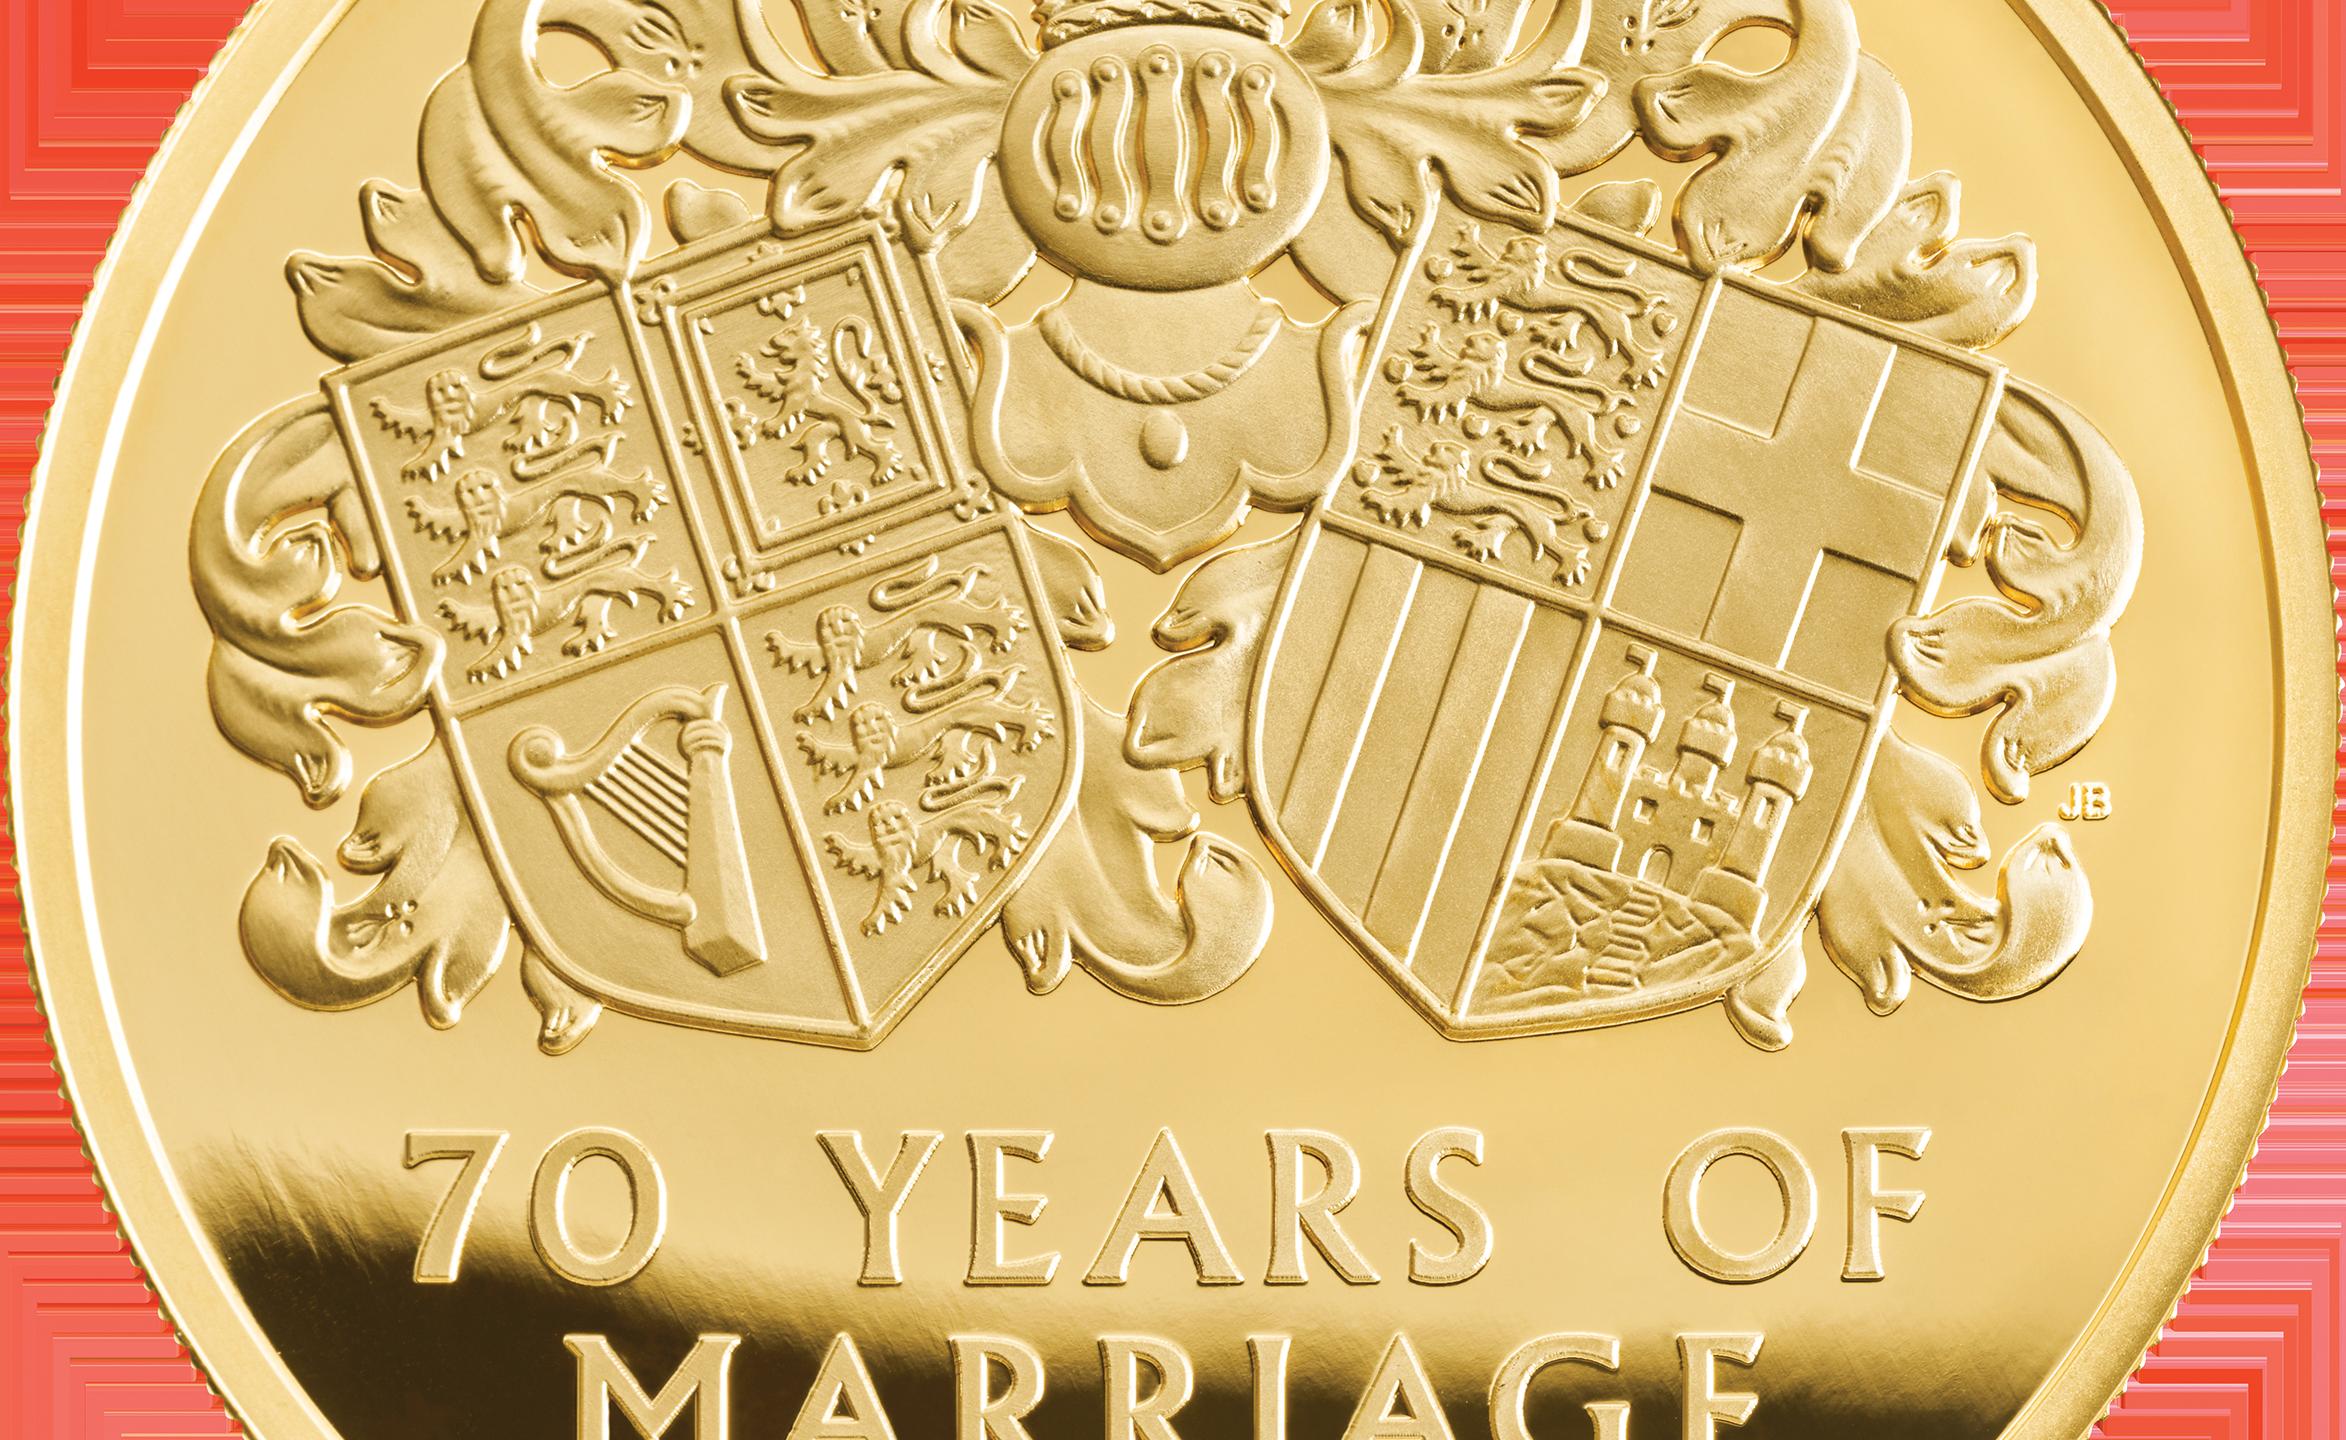 Platinum Wedding 2017 UK Five-Ounce Gold Proof Coin rev tone - ukp07516